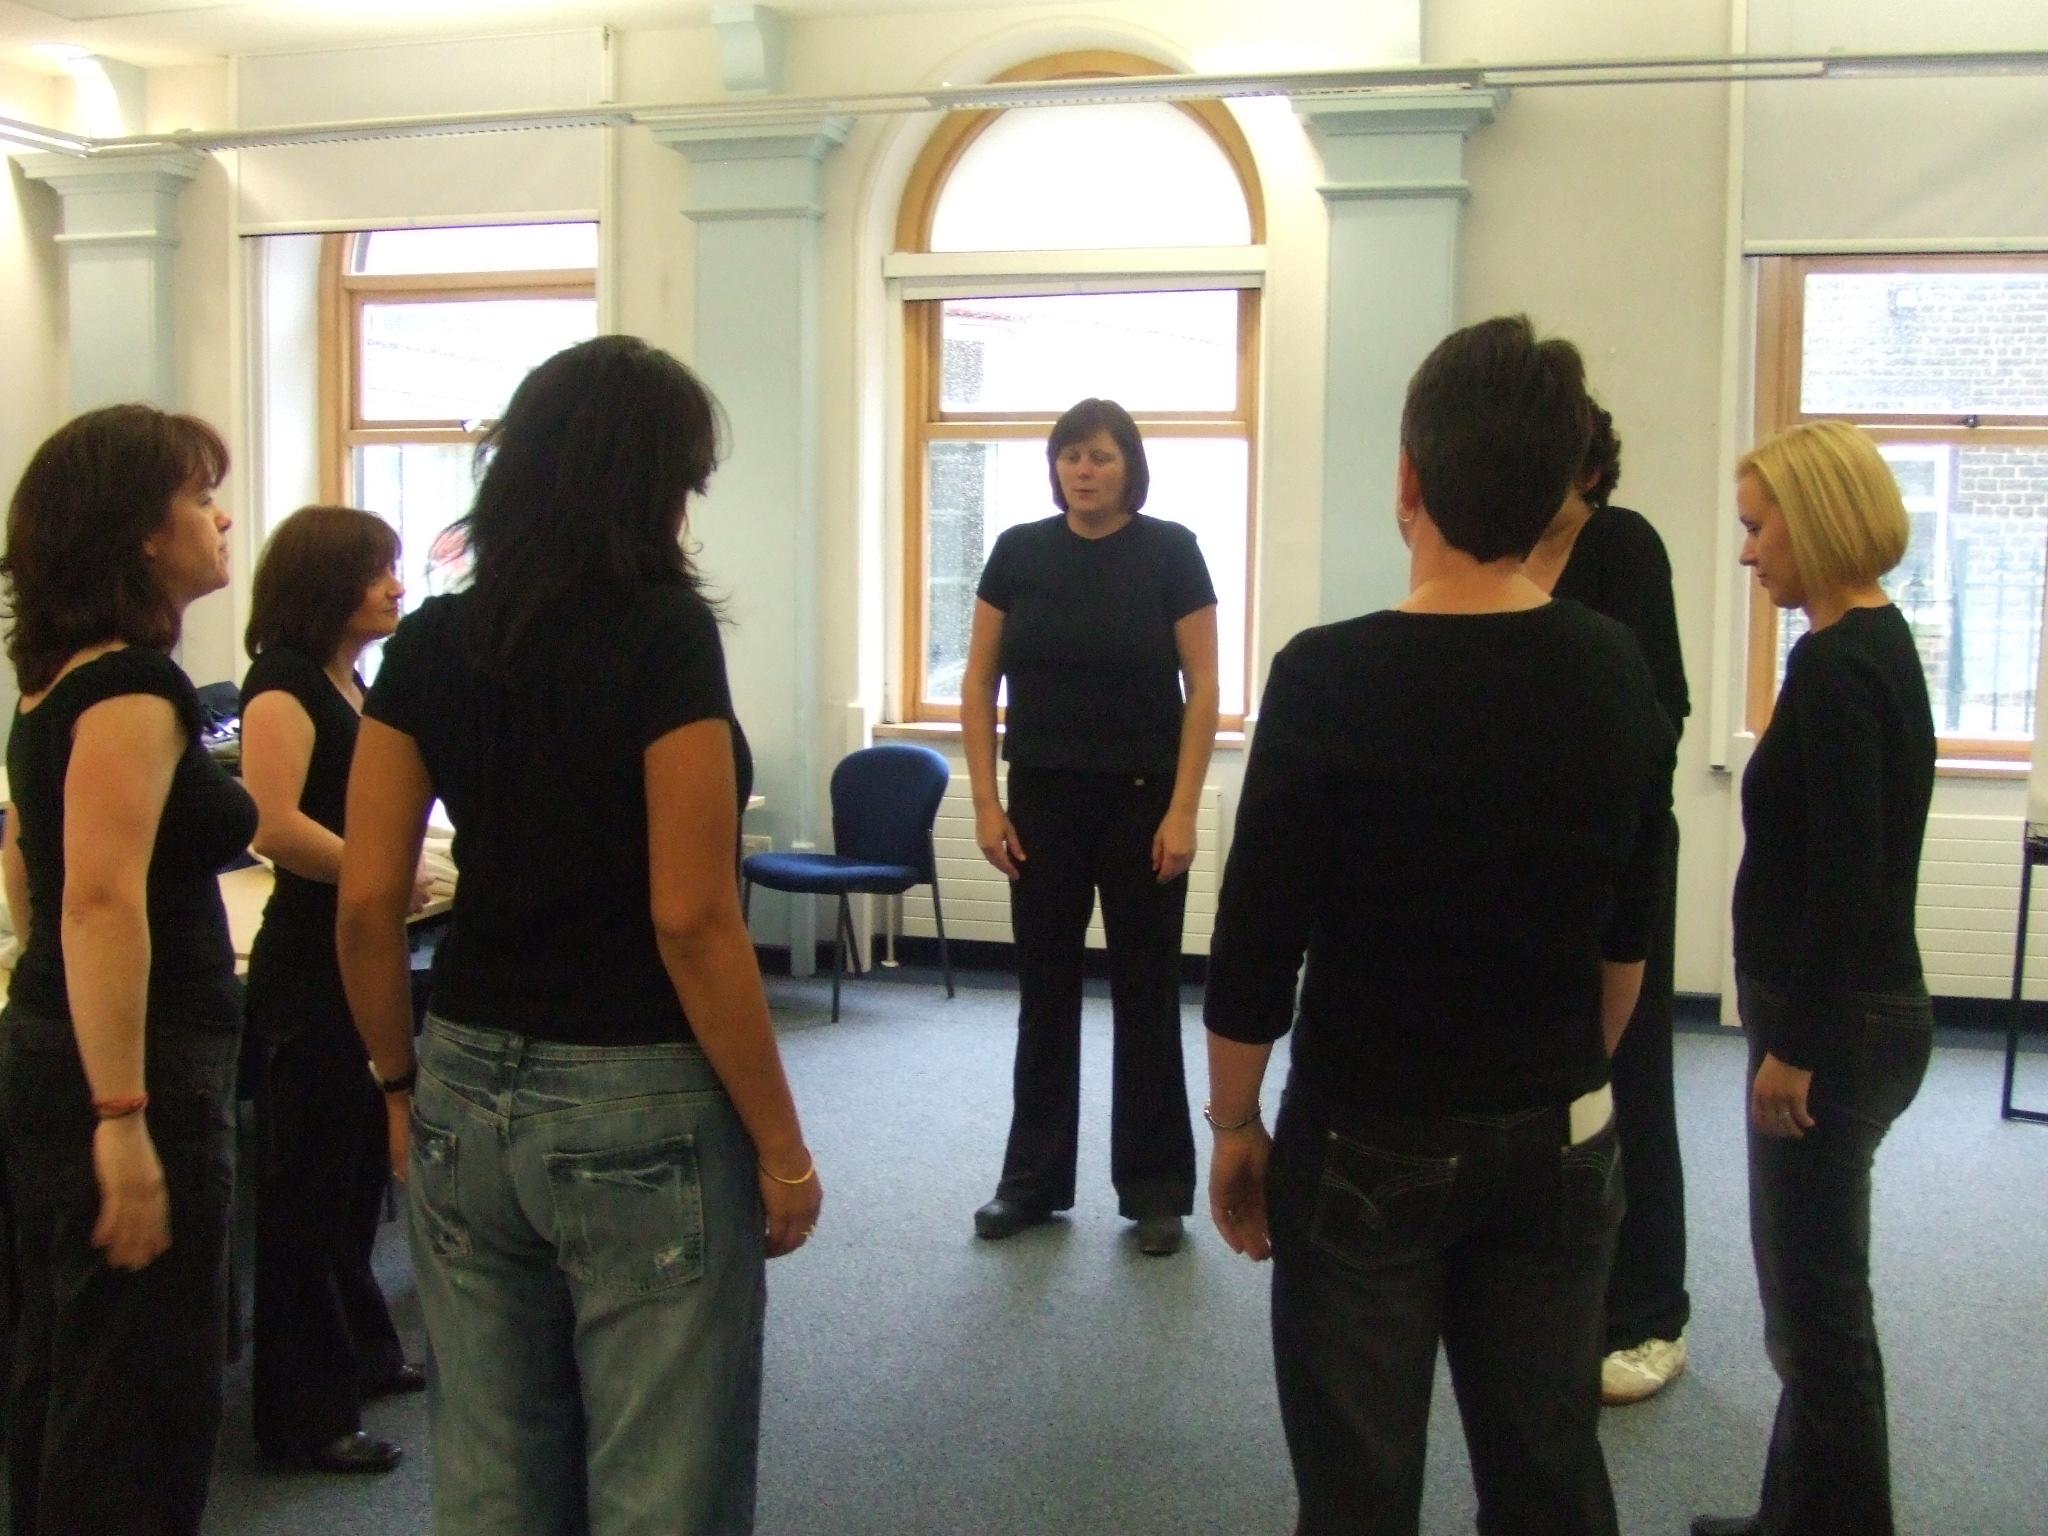 pre-performance rehearsal